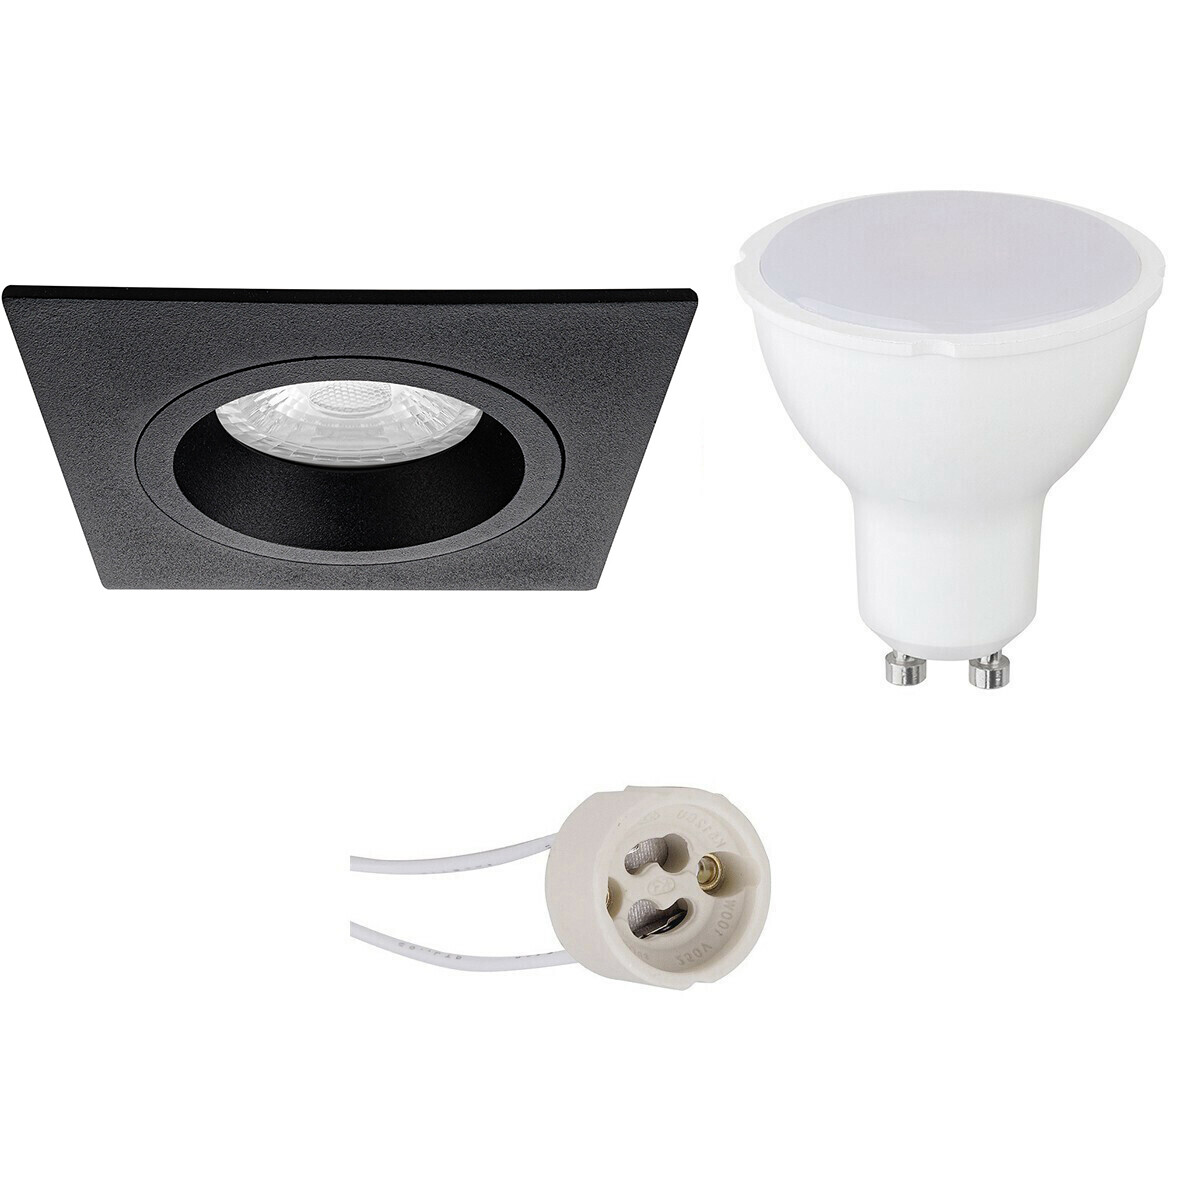 LED Spot Set - Pragmi Rodos Pro - GU10 Fitting - Inbouw Vierkant - Mat Zwart - 6W - Natuurlijk Wit 4